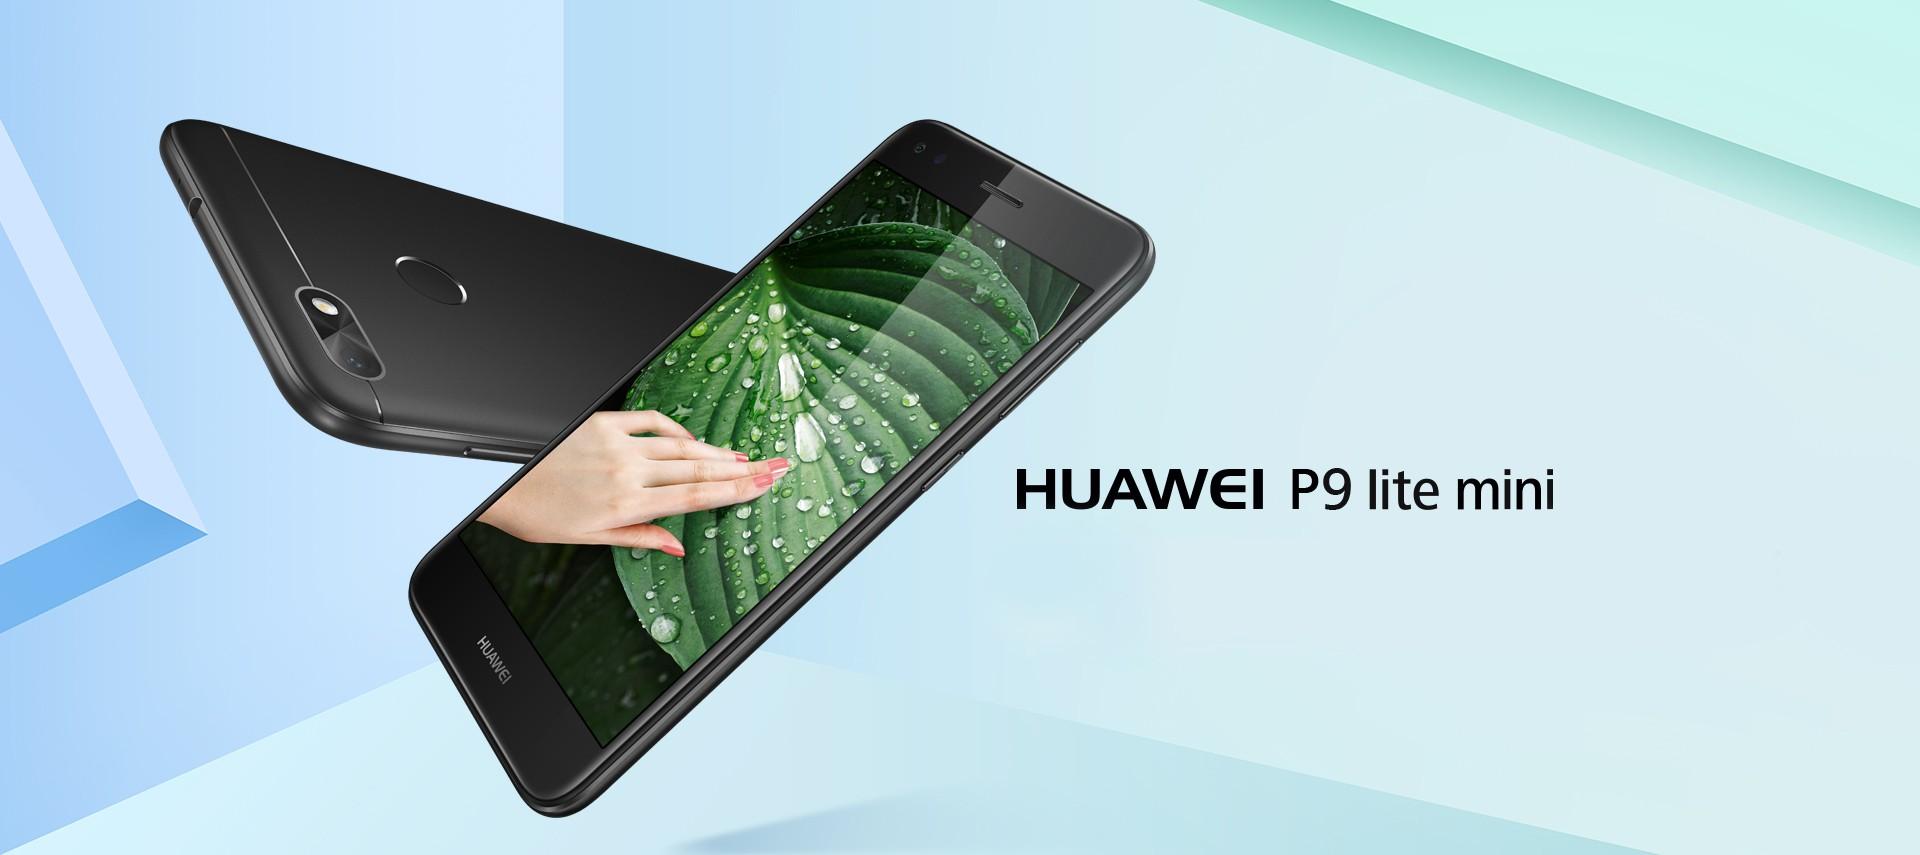 huawei p9 lite mini smartphone mobile phones huawei polska. Black Bedroom Furniture Sets. Home Design Ideas